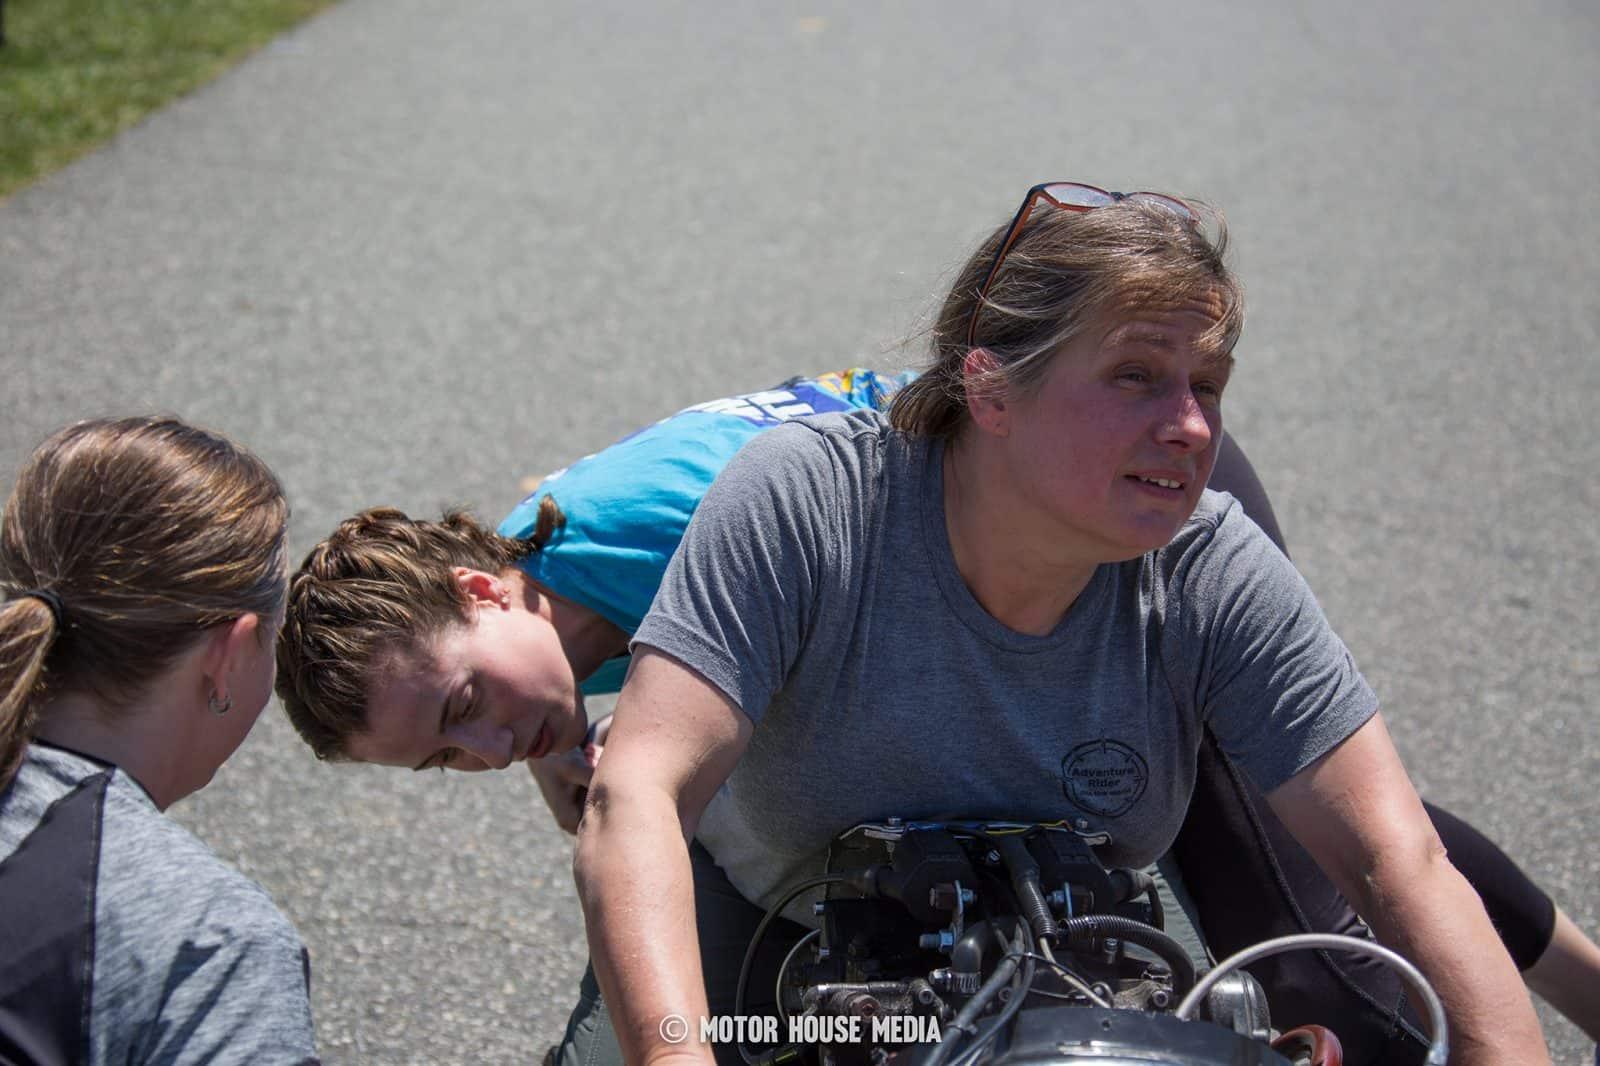 AHRMA vintage Sidecar bike Monkey in training